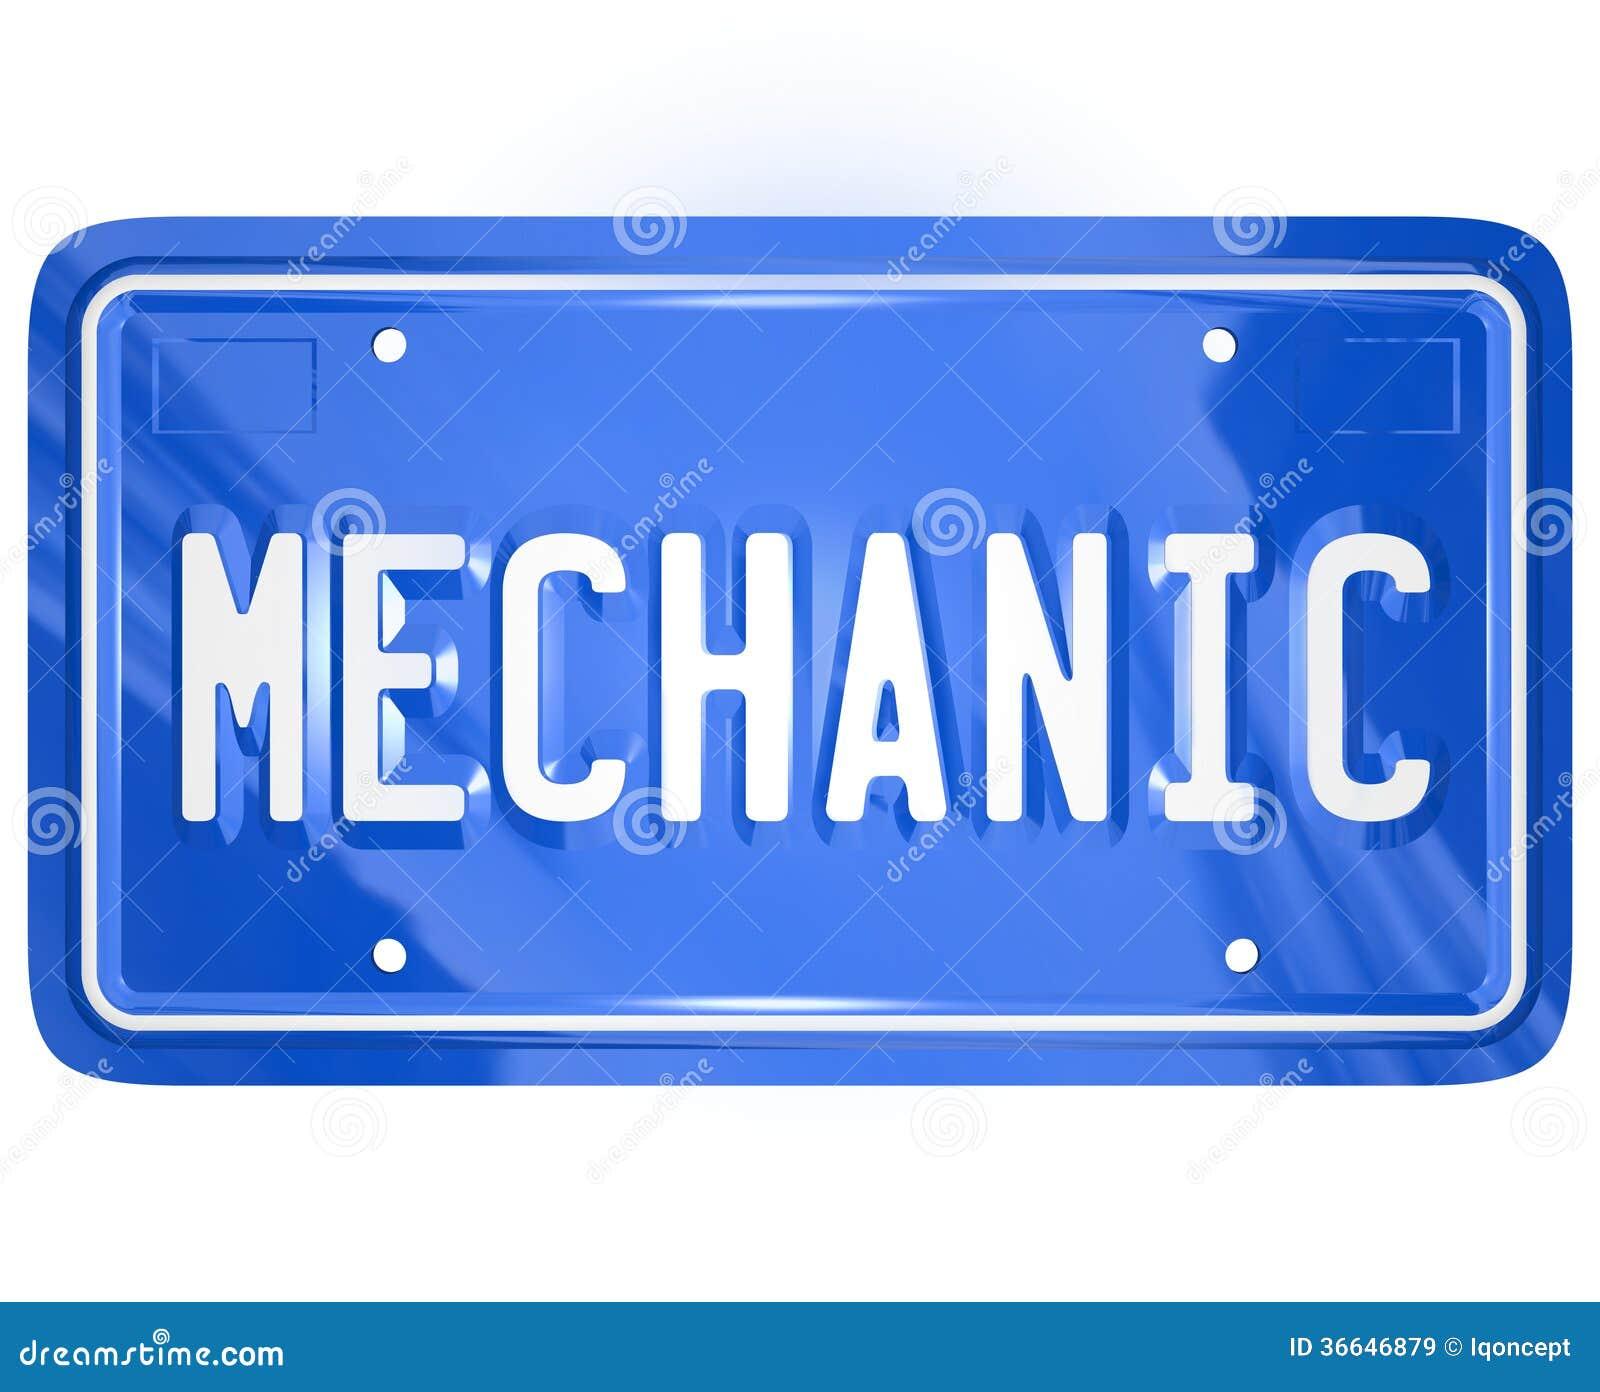 Mechanic word vanity license plate auto repair shop garage for Motor vehicle repair license